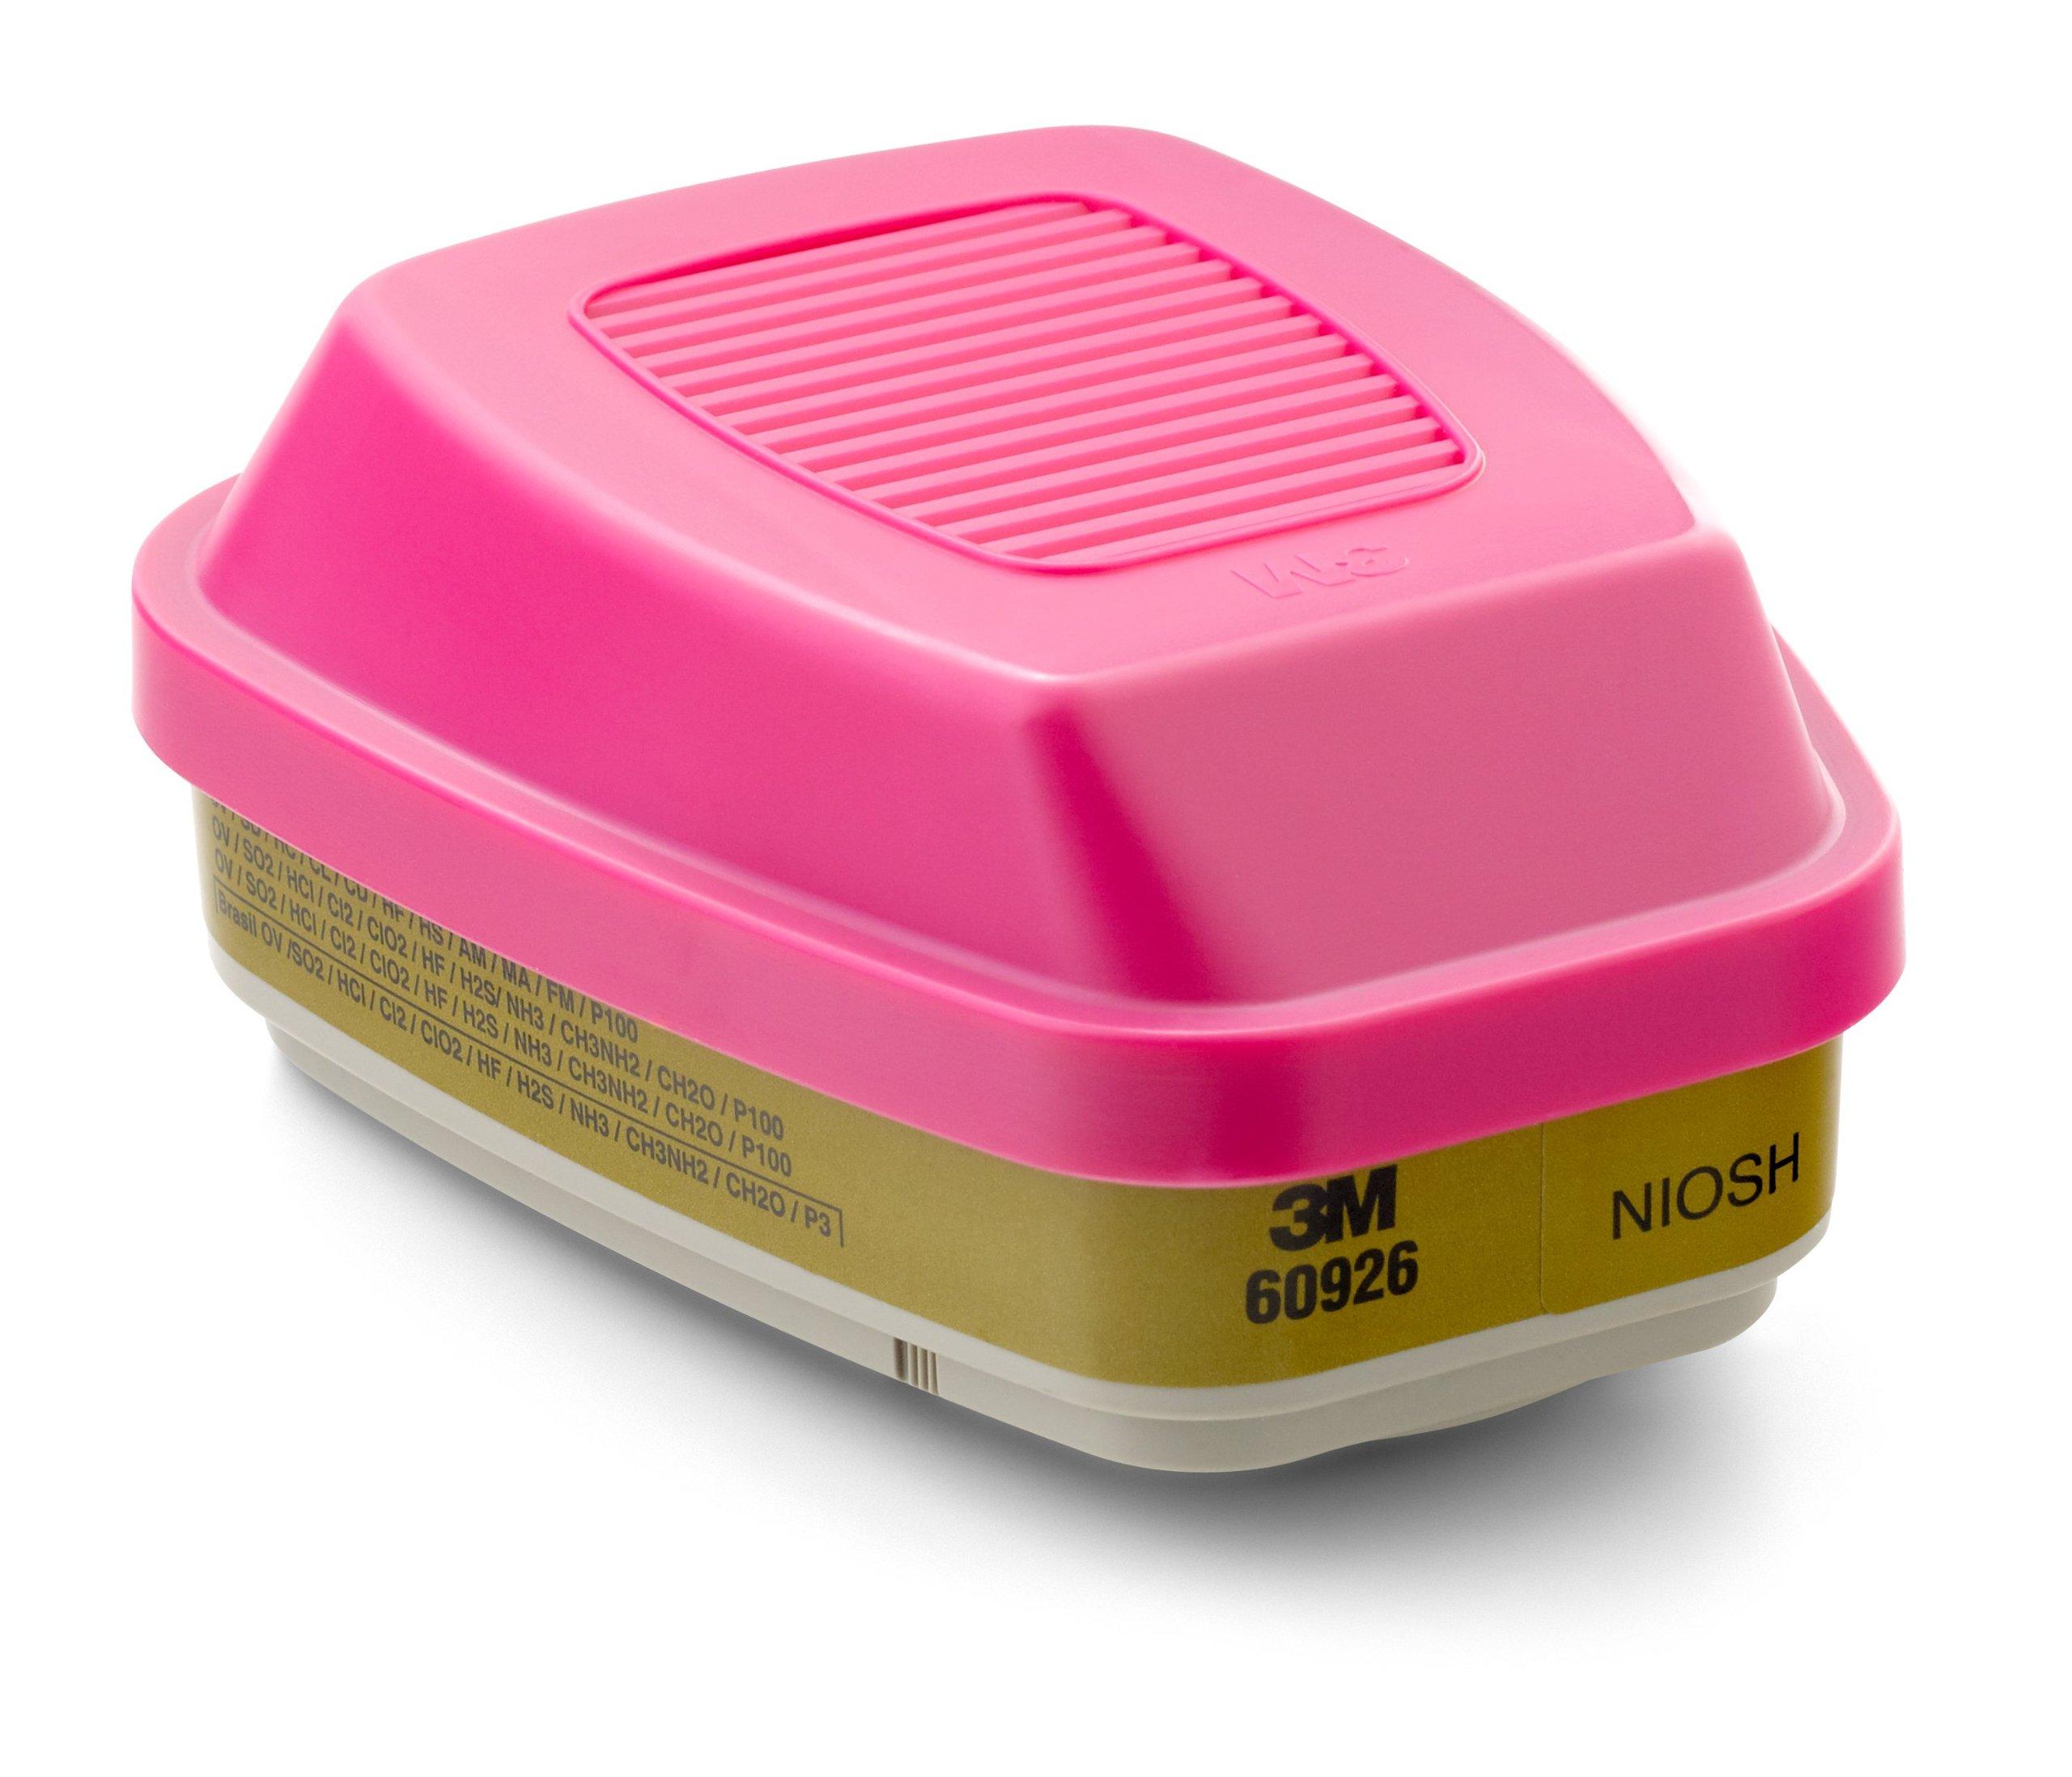 3M Multi Gas/Vapor Cartridge/Filter 60926, P100 Respiratory Protection (Pack of 2)